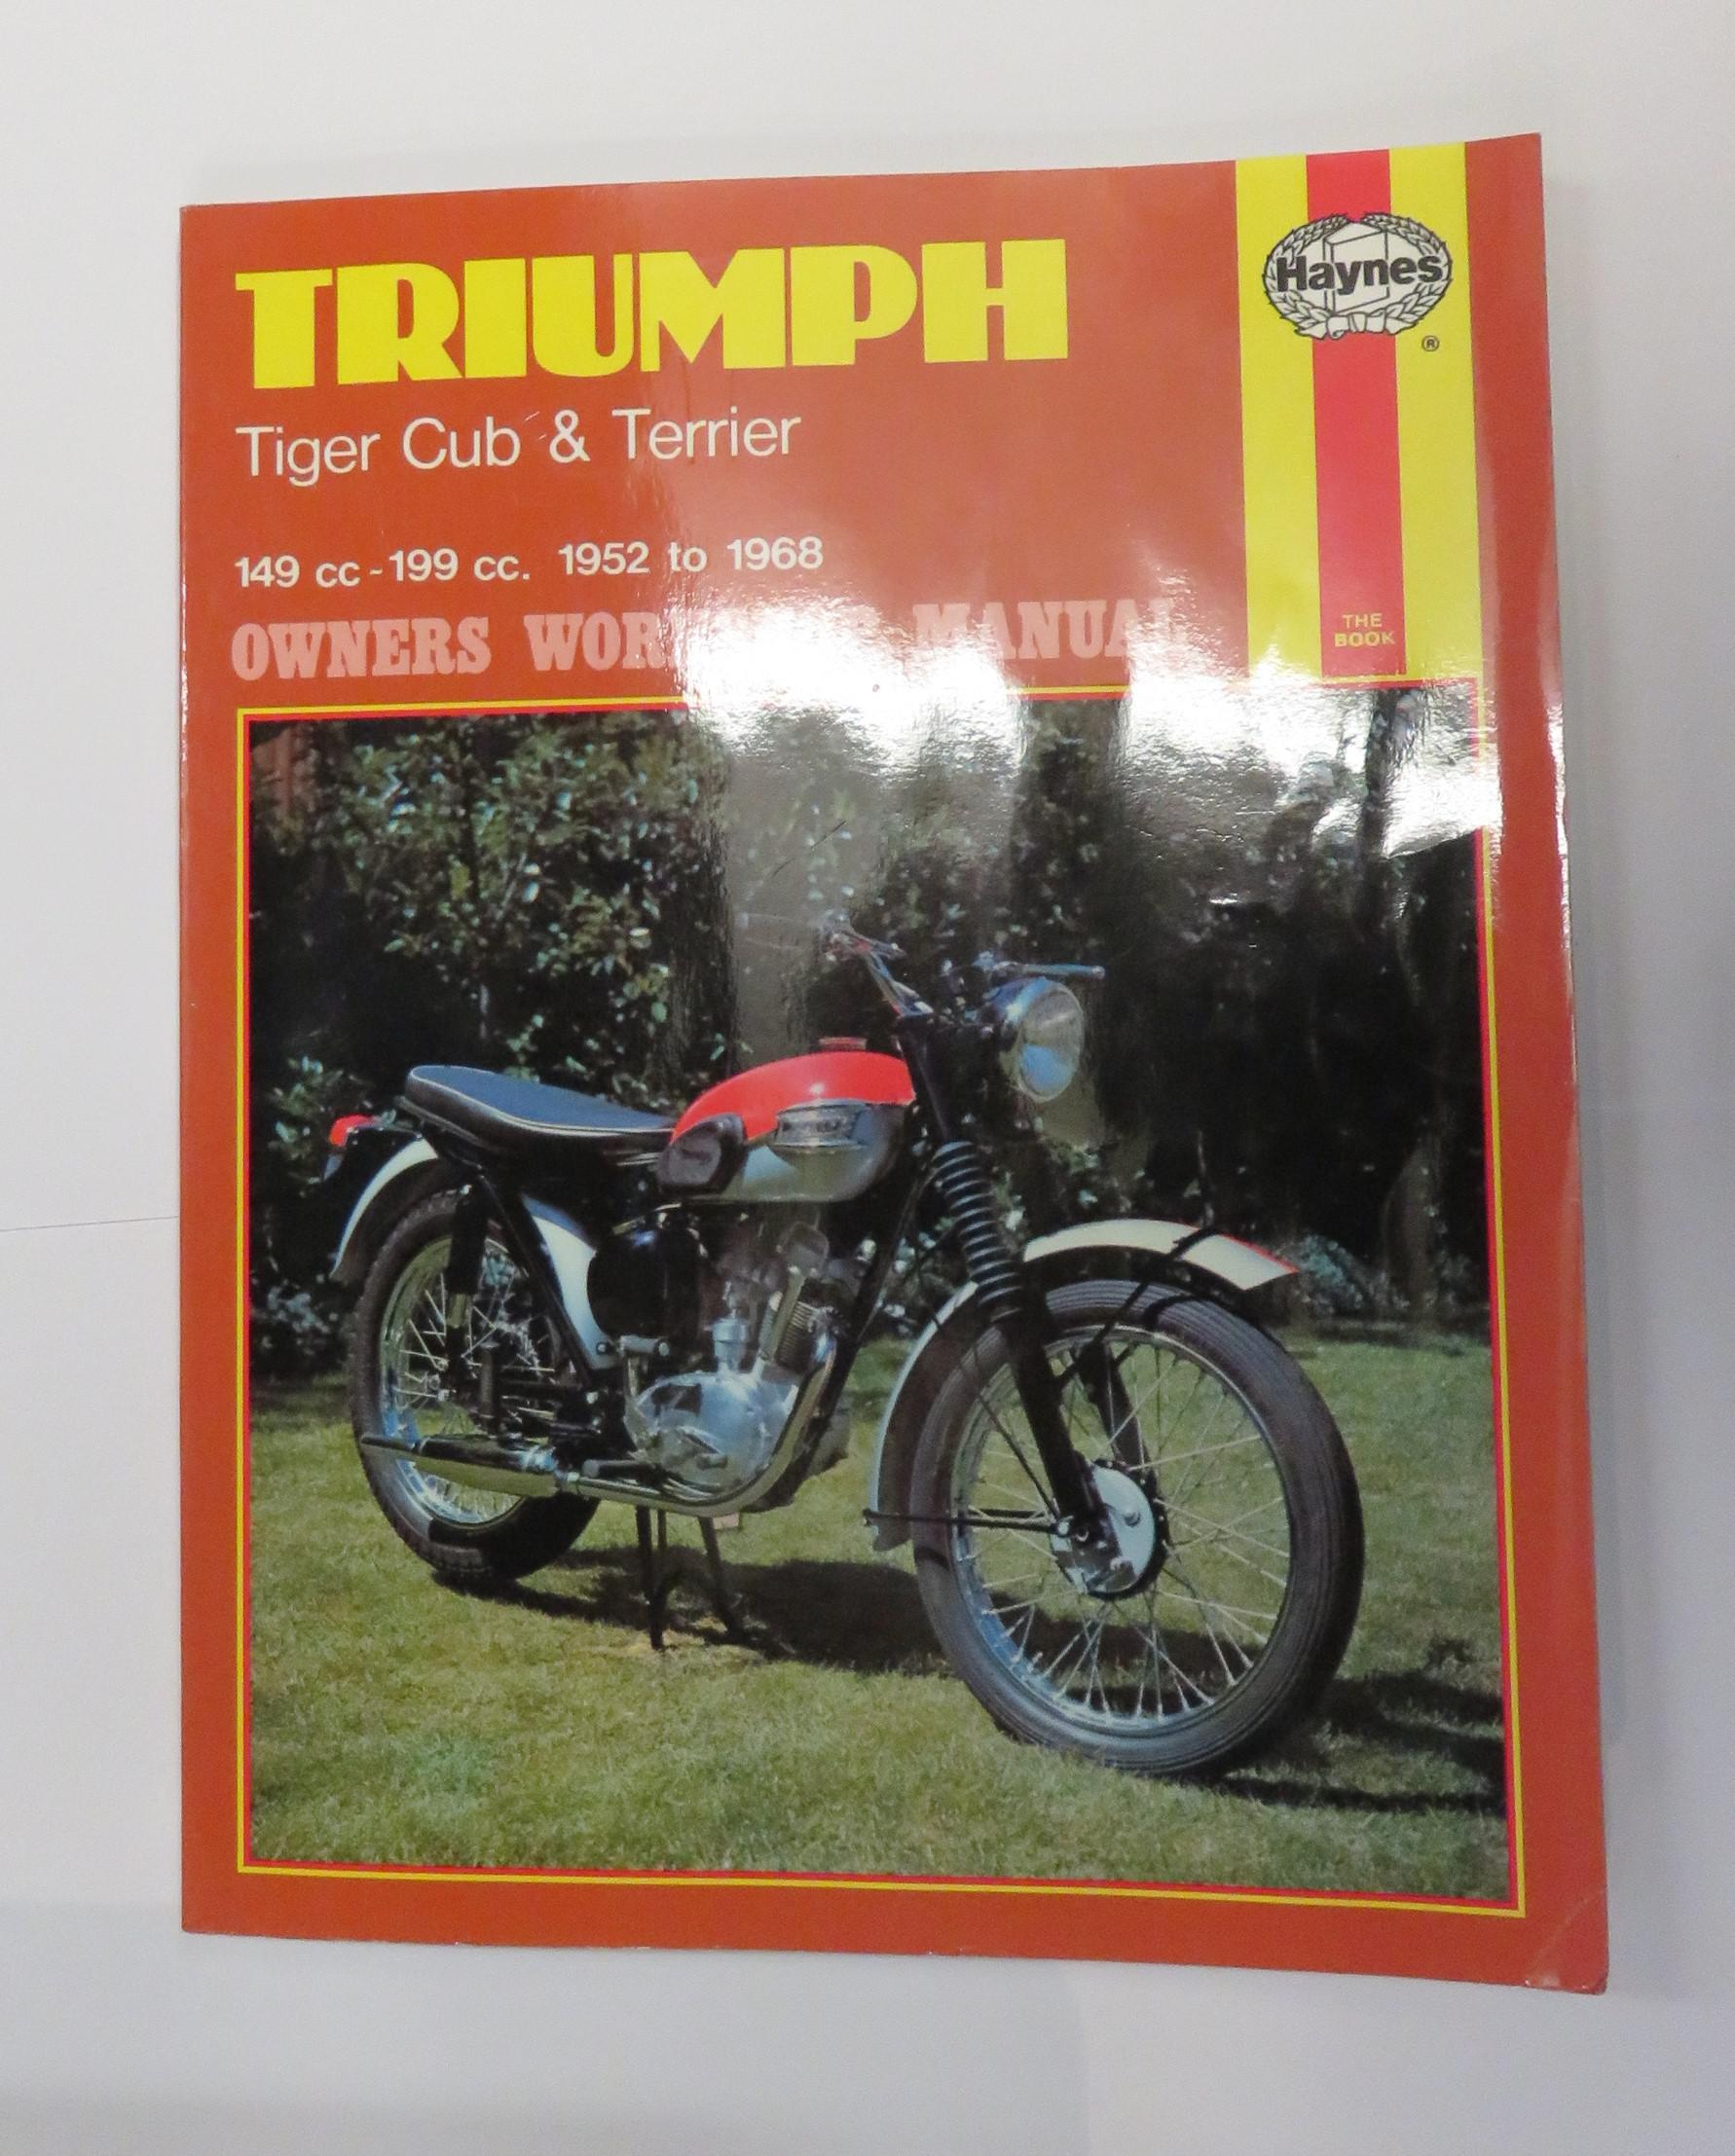 Triumph: Tiger Cub & Terrier